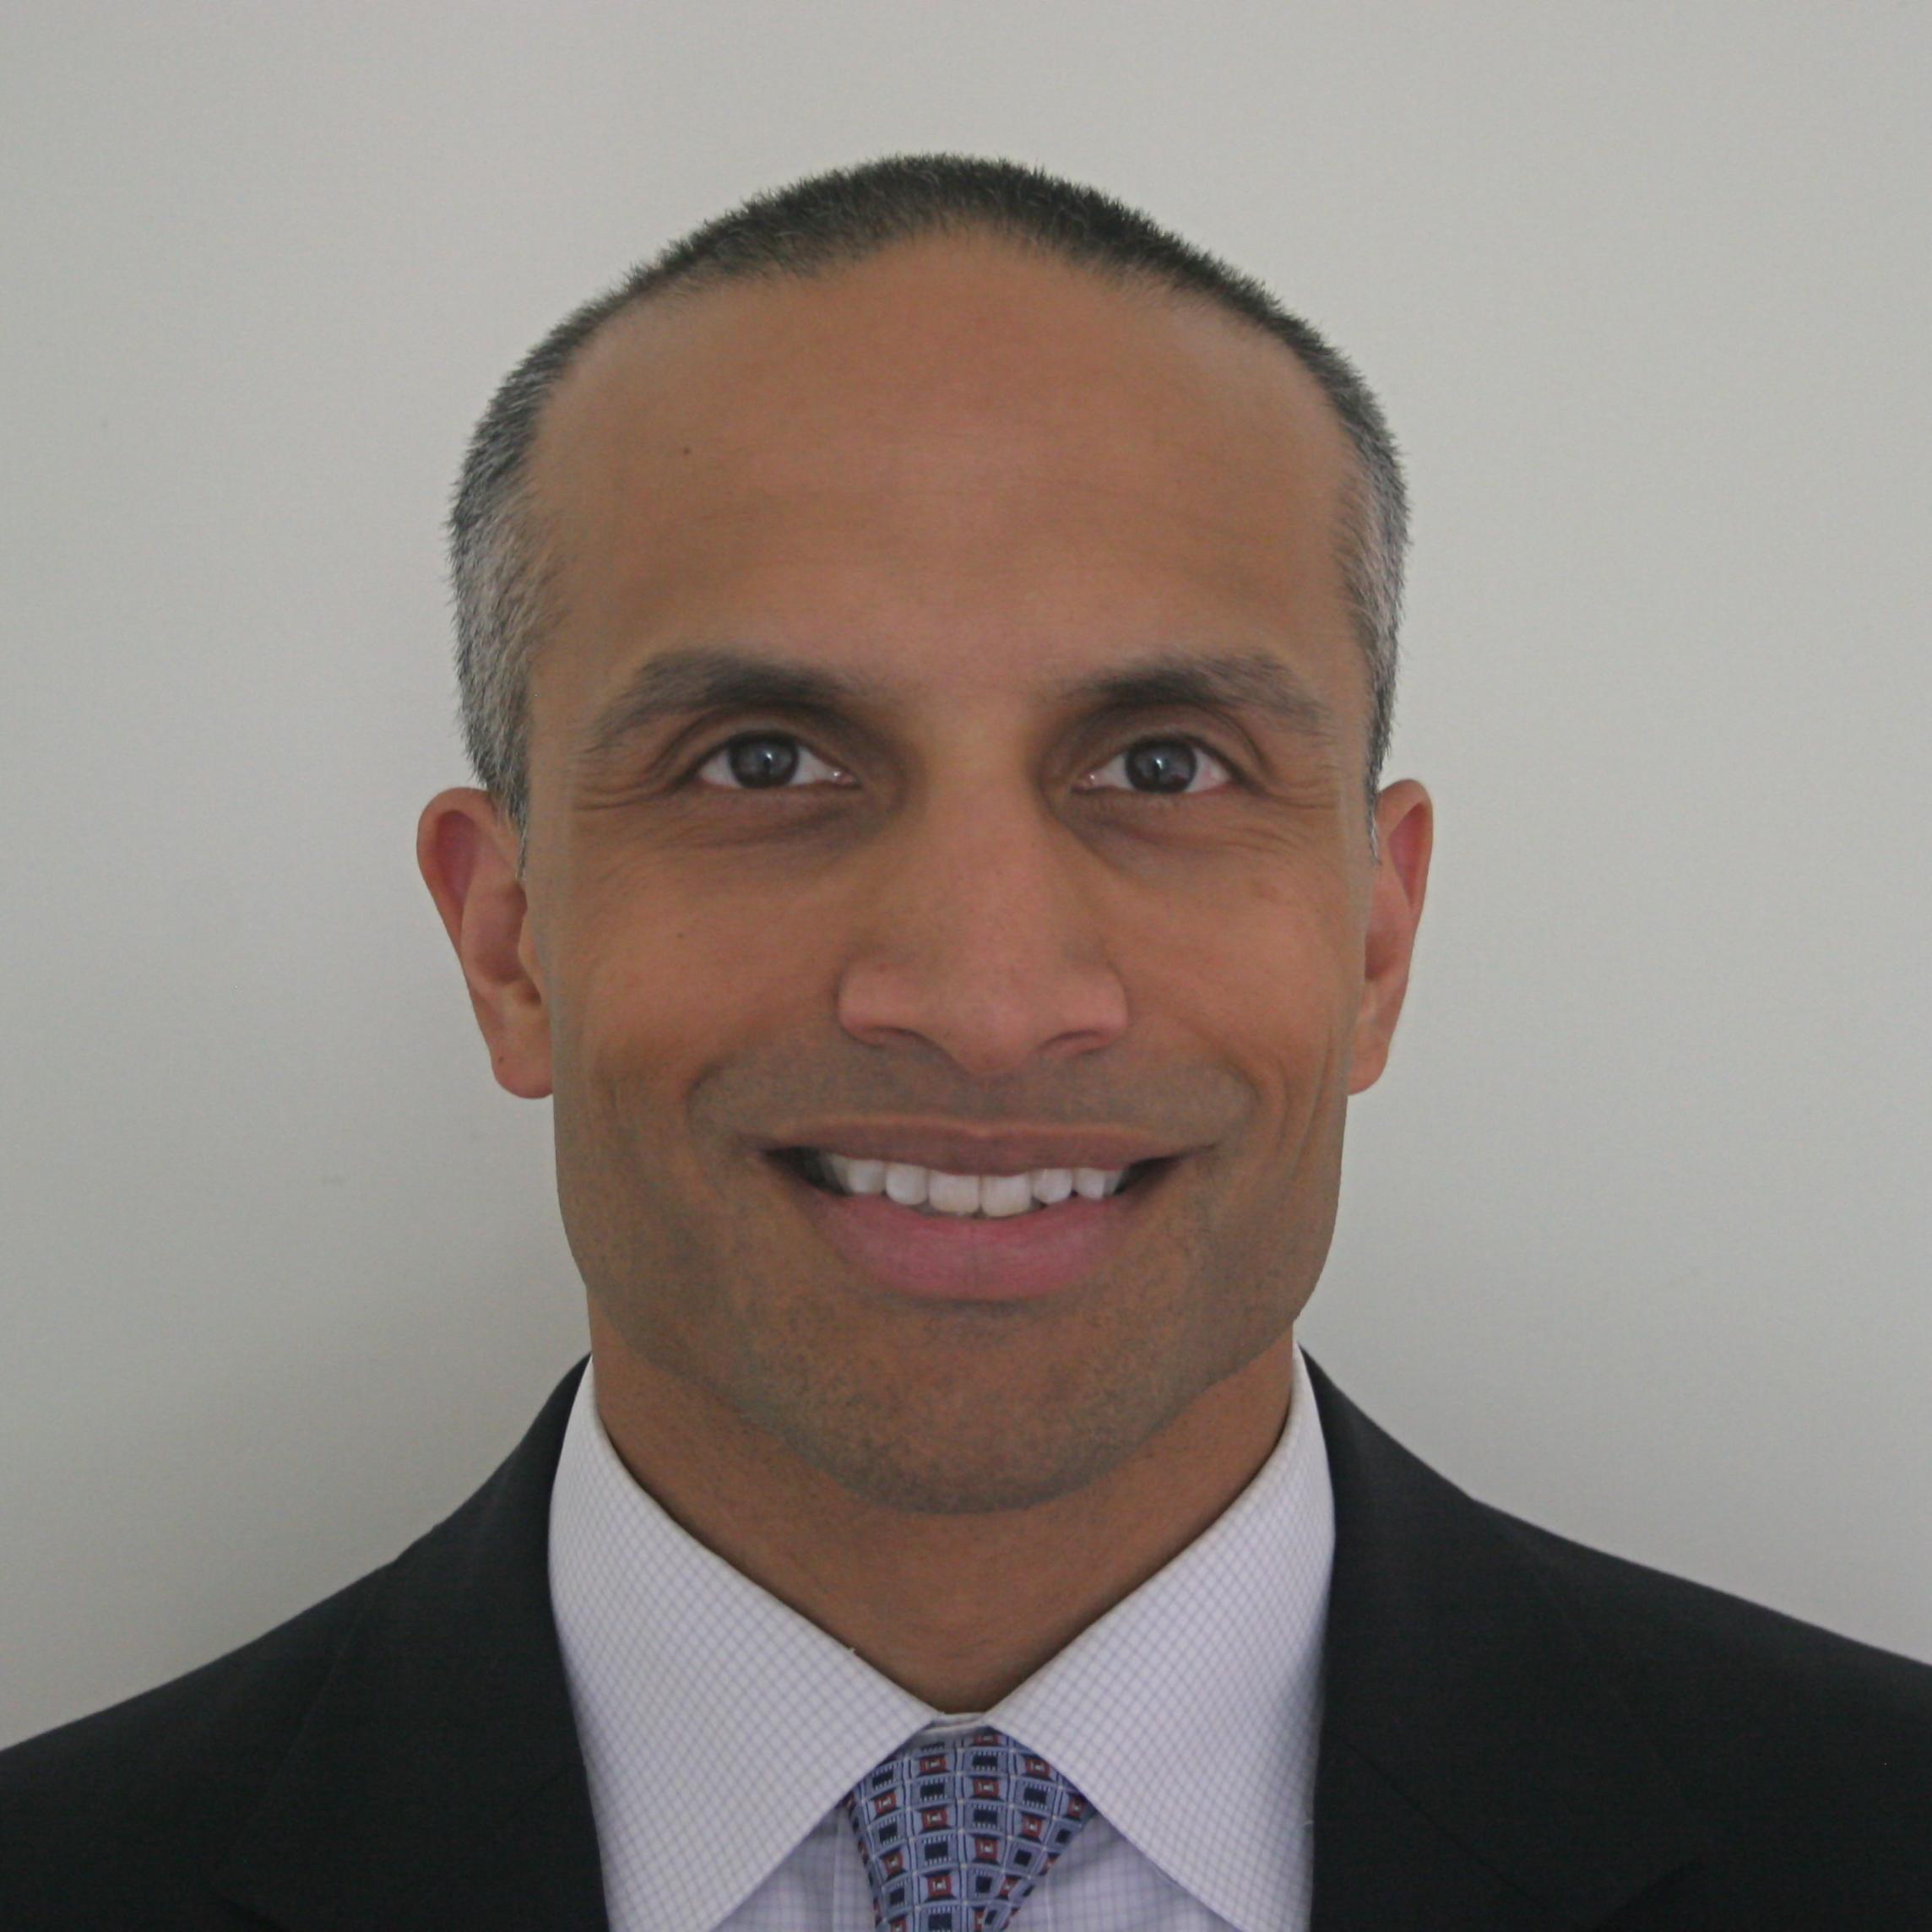 Rahul A. Somvanshi, MD